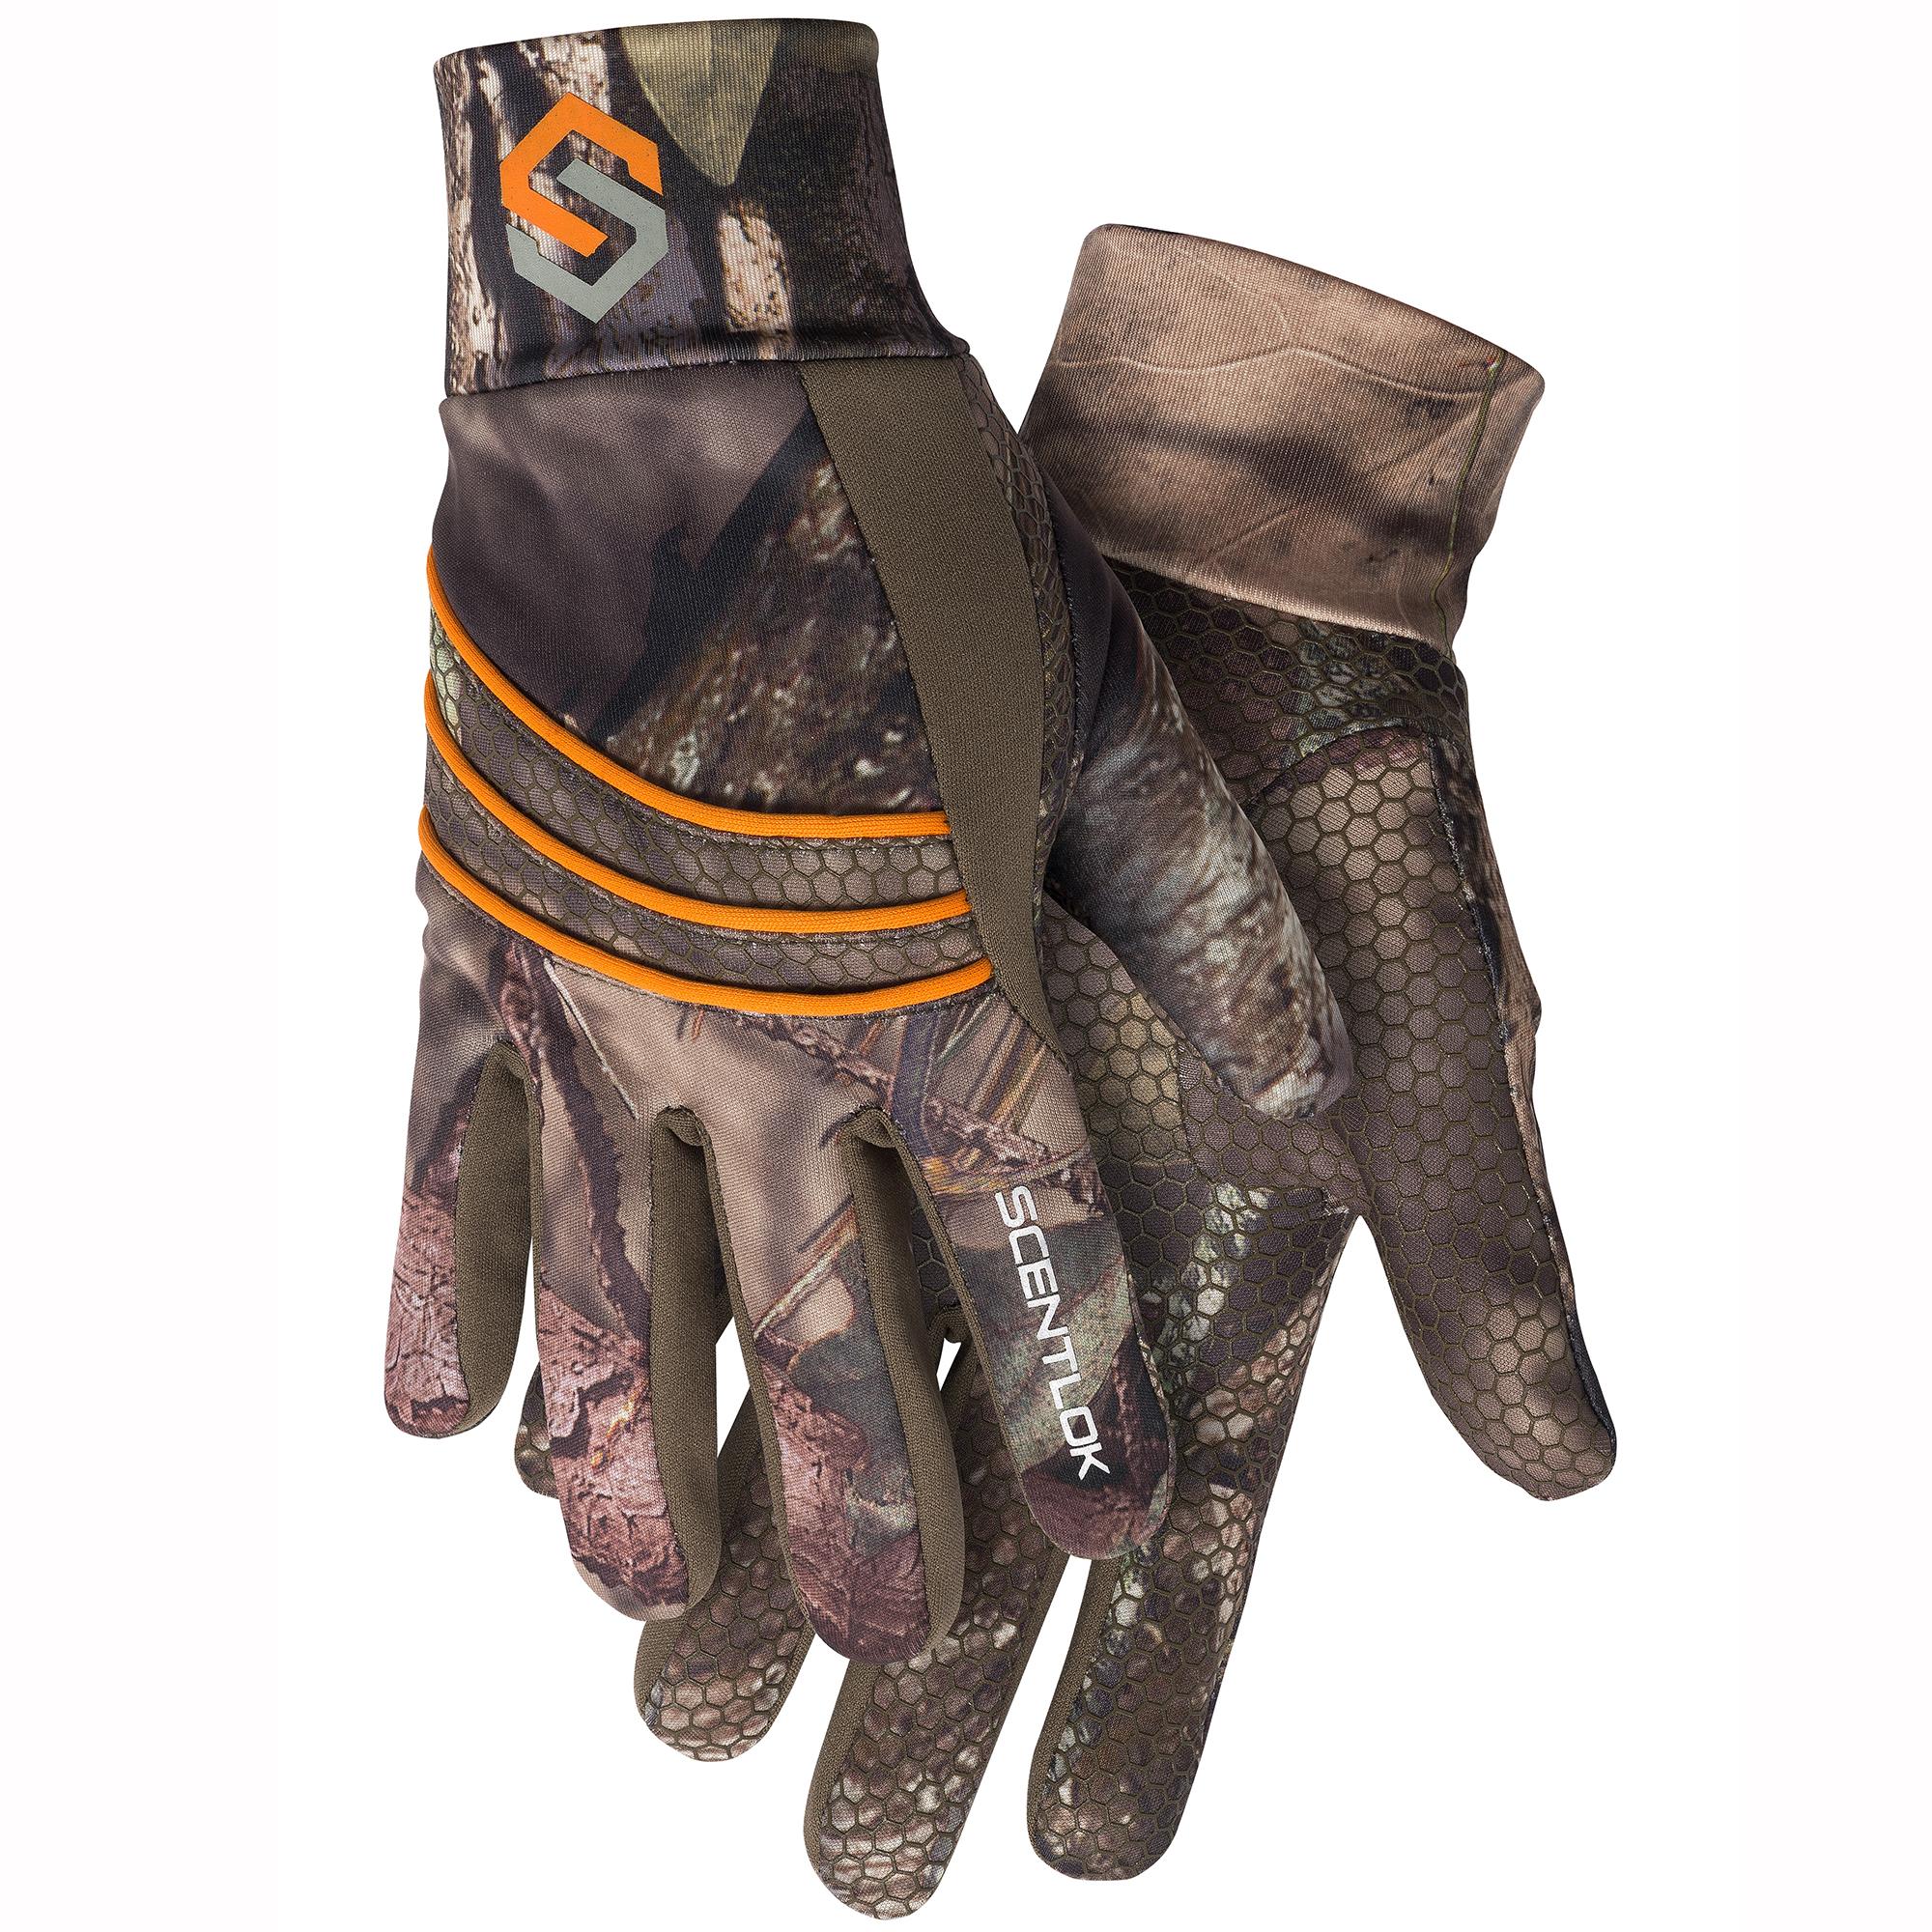 ScentLok Men's Savanna Lightweight Shooter's Glove